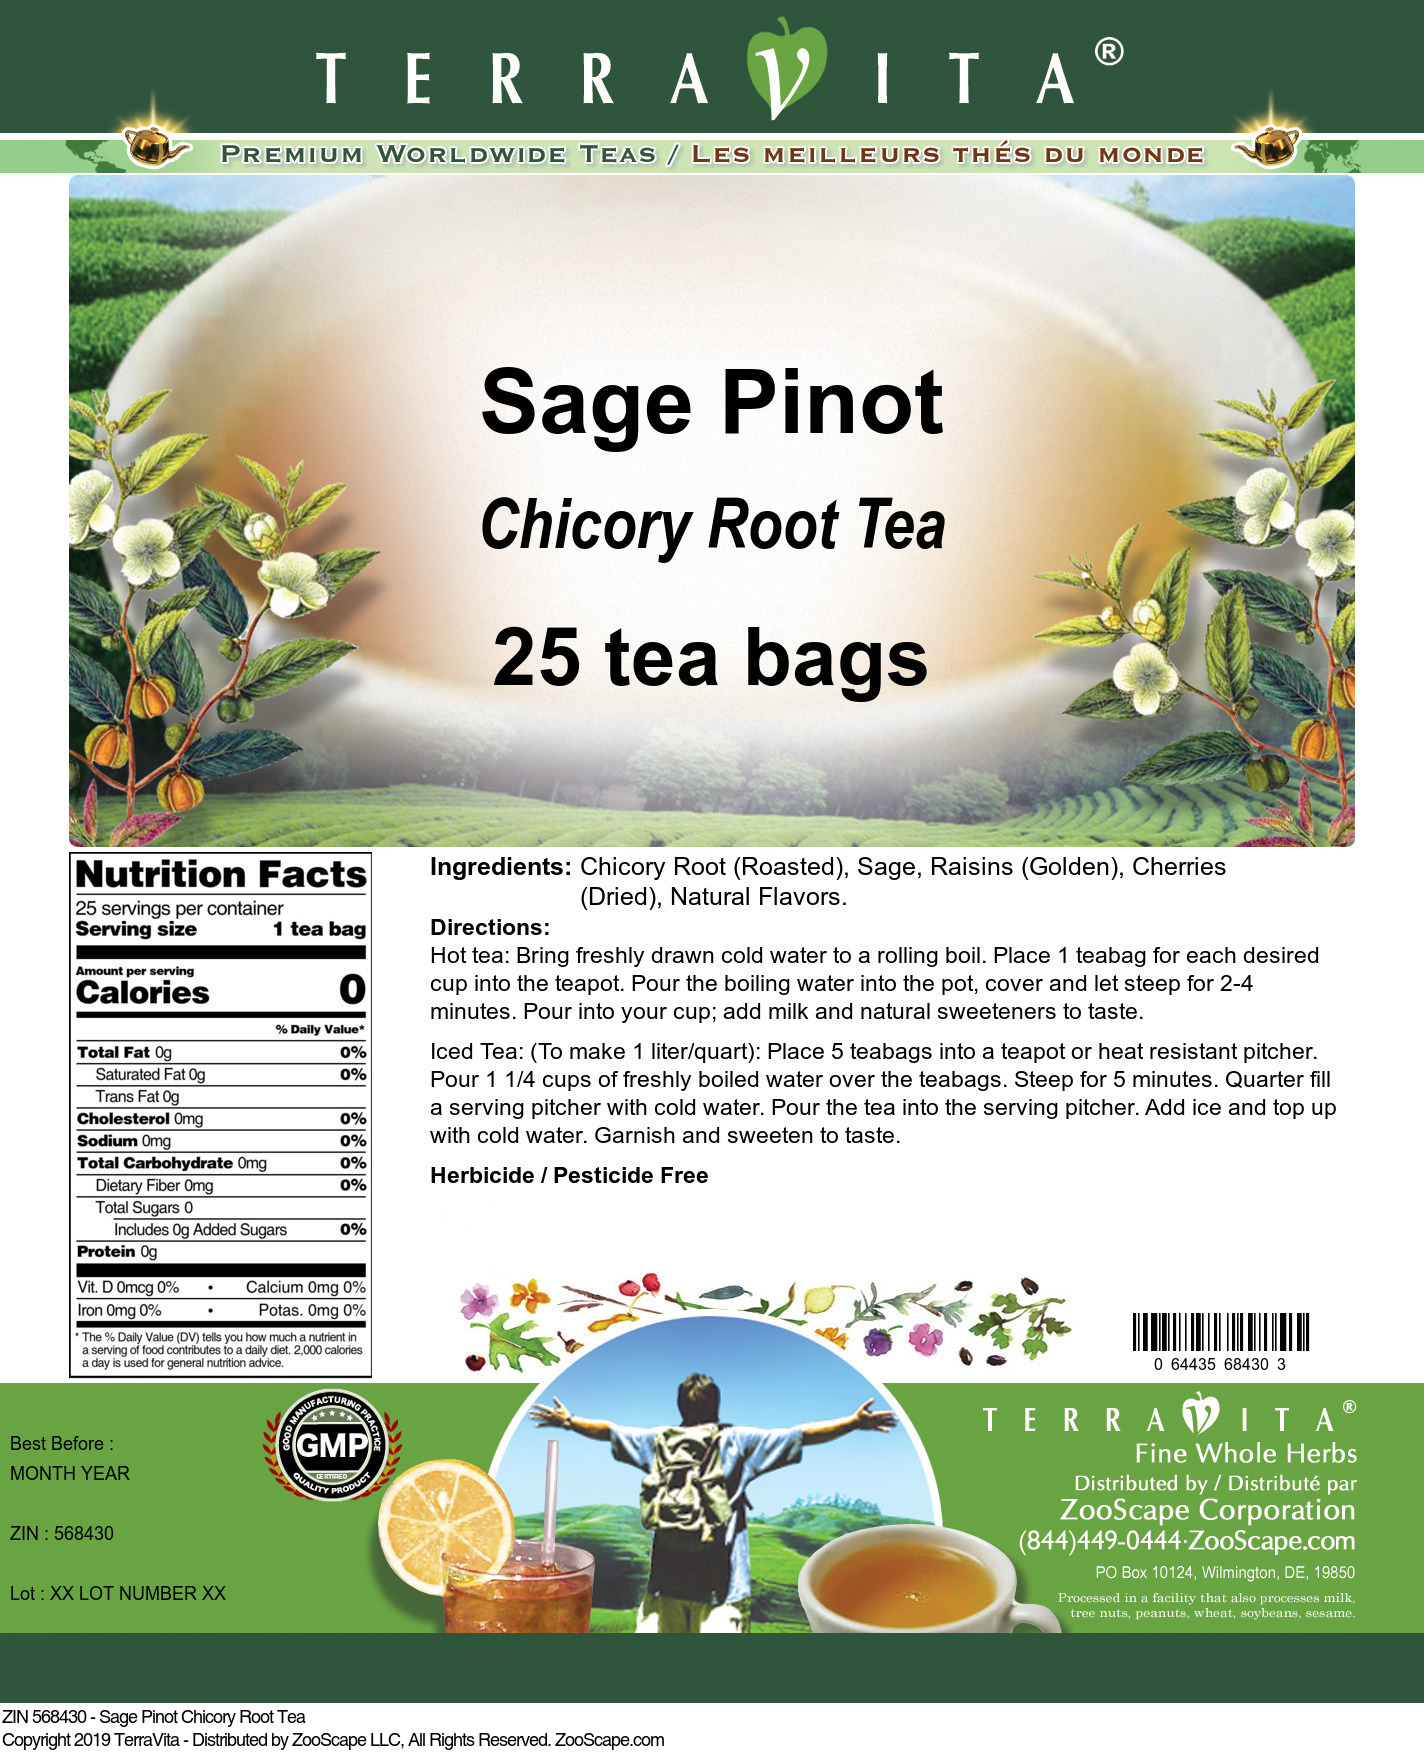 Sage Pinot Chicory Root Tea